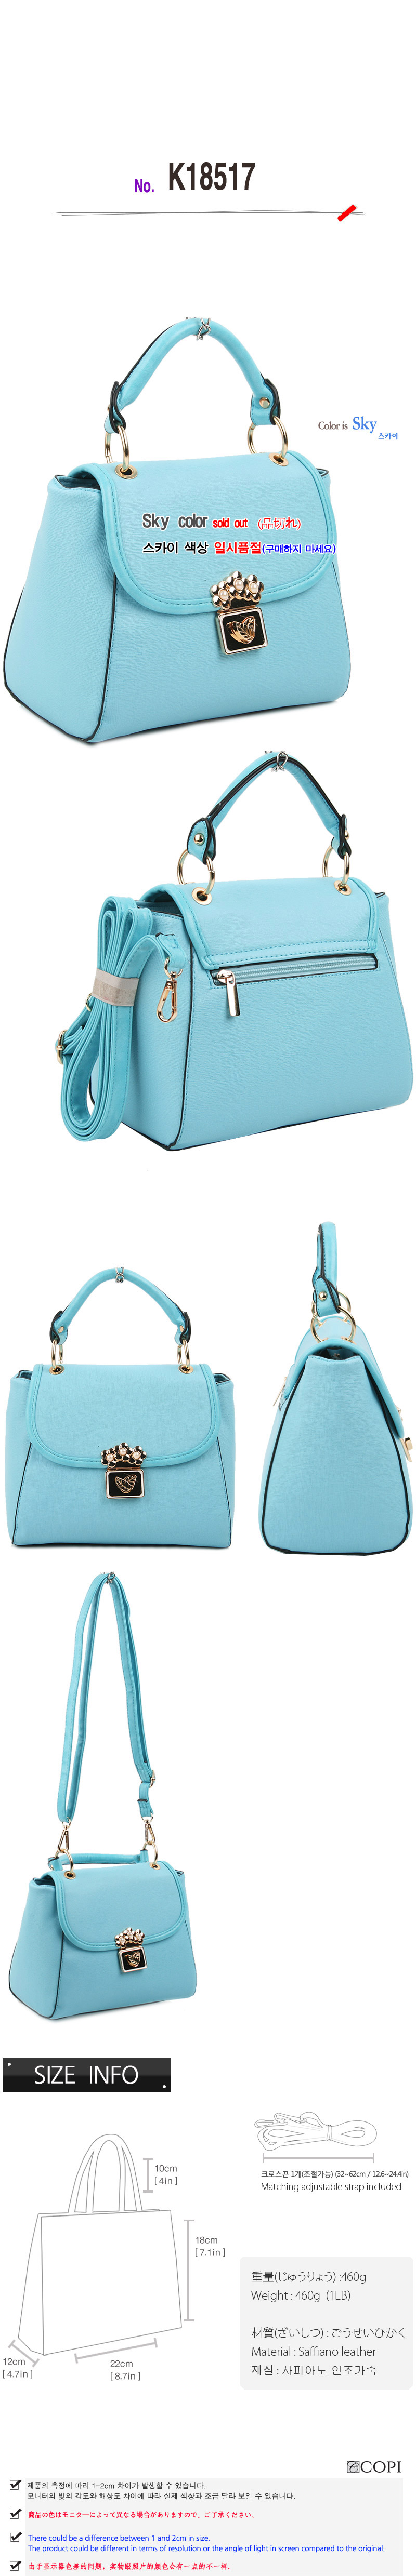 minibag no.K18517view